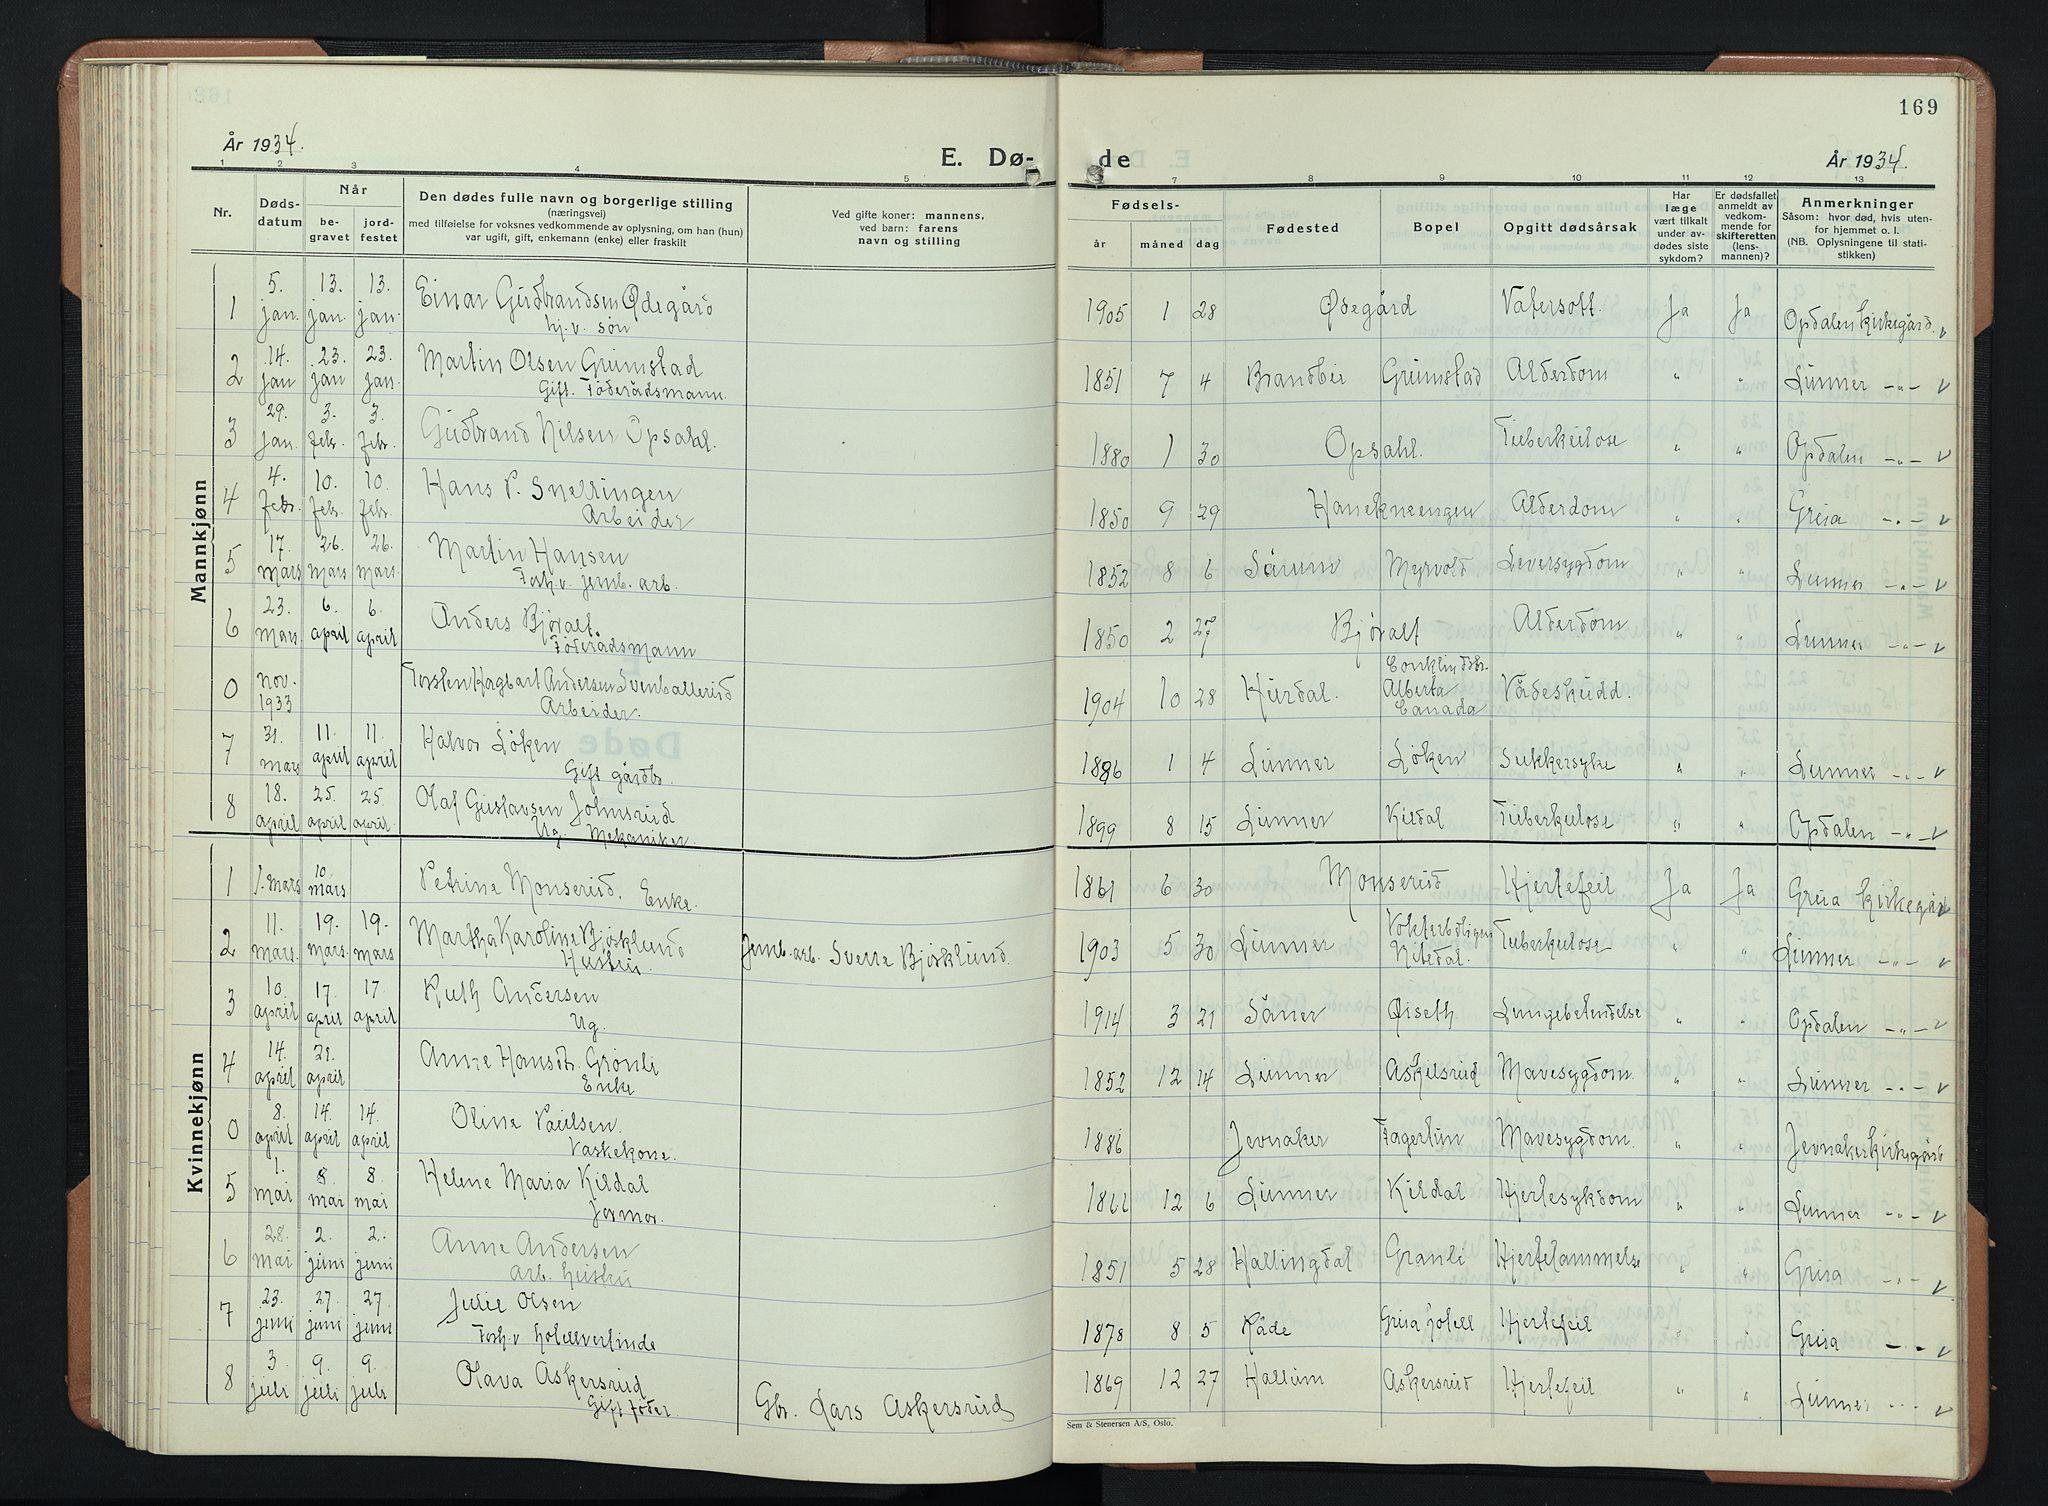 SAH, Lunner prestekontor, H/Ha/Hab/L0003: Klokkerbok nr. 3, 1933-1945, s. 169